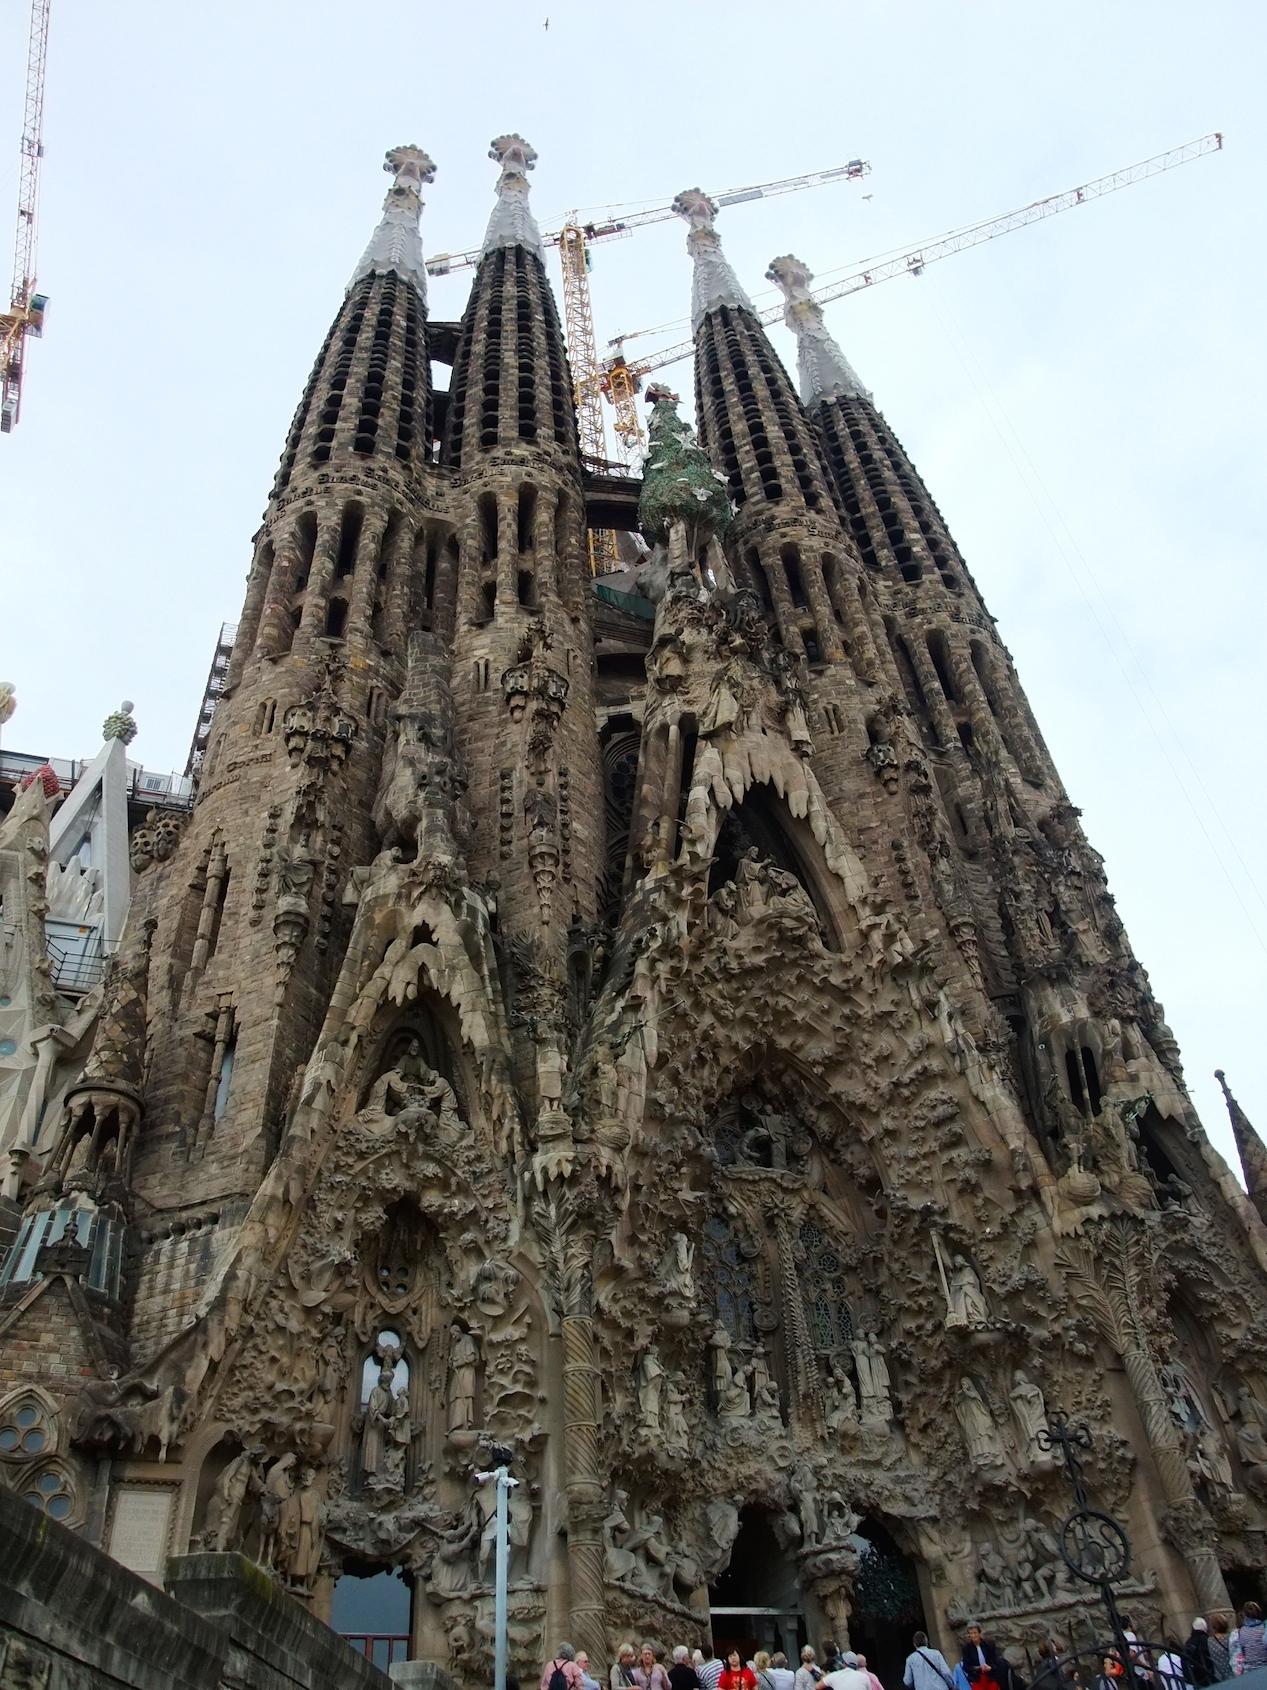 The Nativity Façade of Sagrada Familia